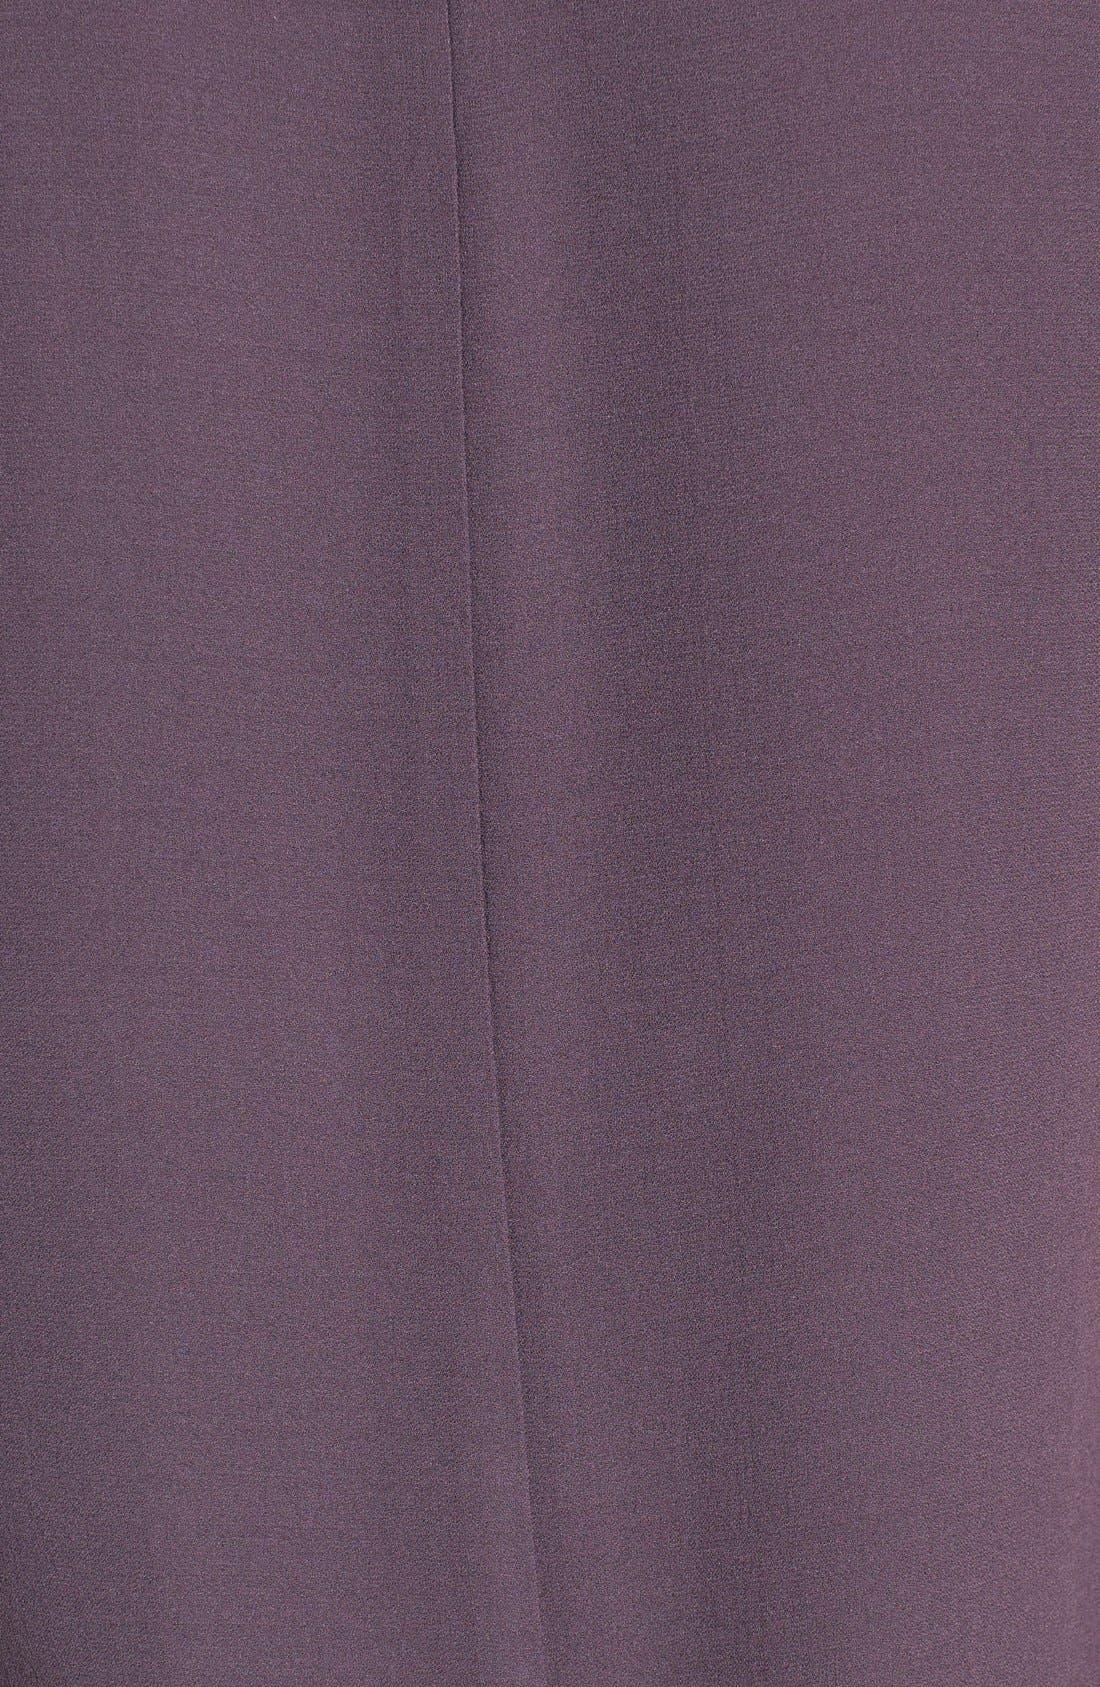 Silk Crepe High Neck Sleeveless Blouse,                             Alternate thumbnail 35, color,